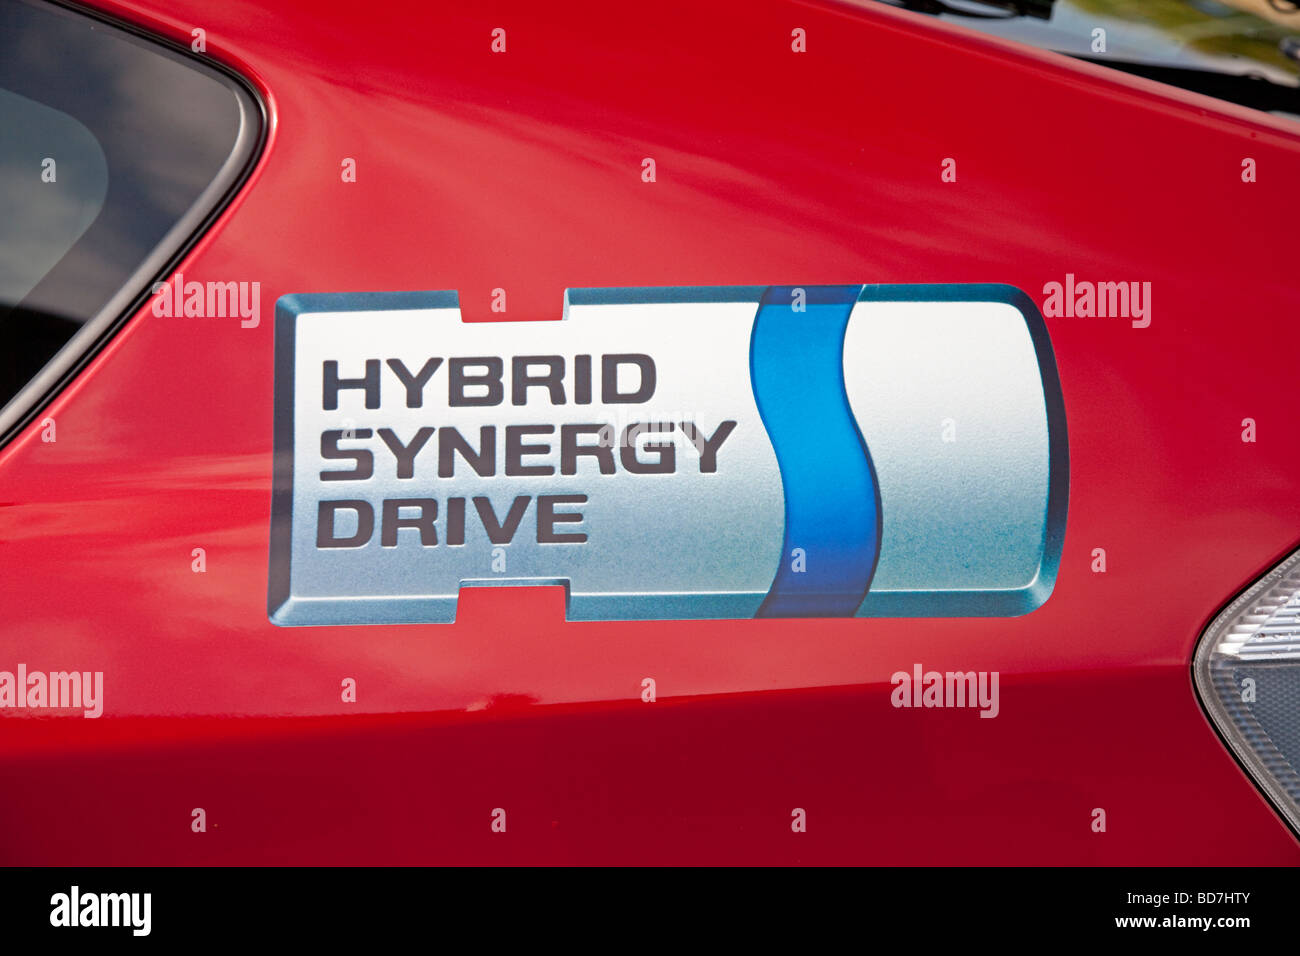 Hybrid Synergy porte le logo de la Toyota Prius hybride T3 voiture Cheltenham UK Photo Stock